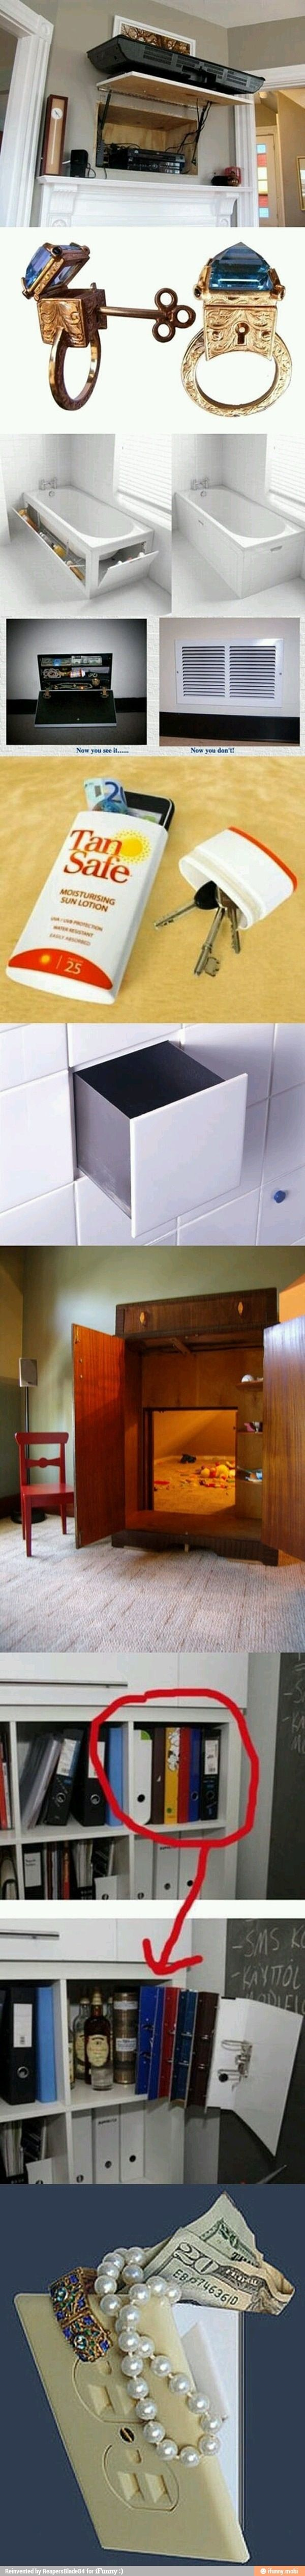 Secret compartments, secret rooms